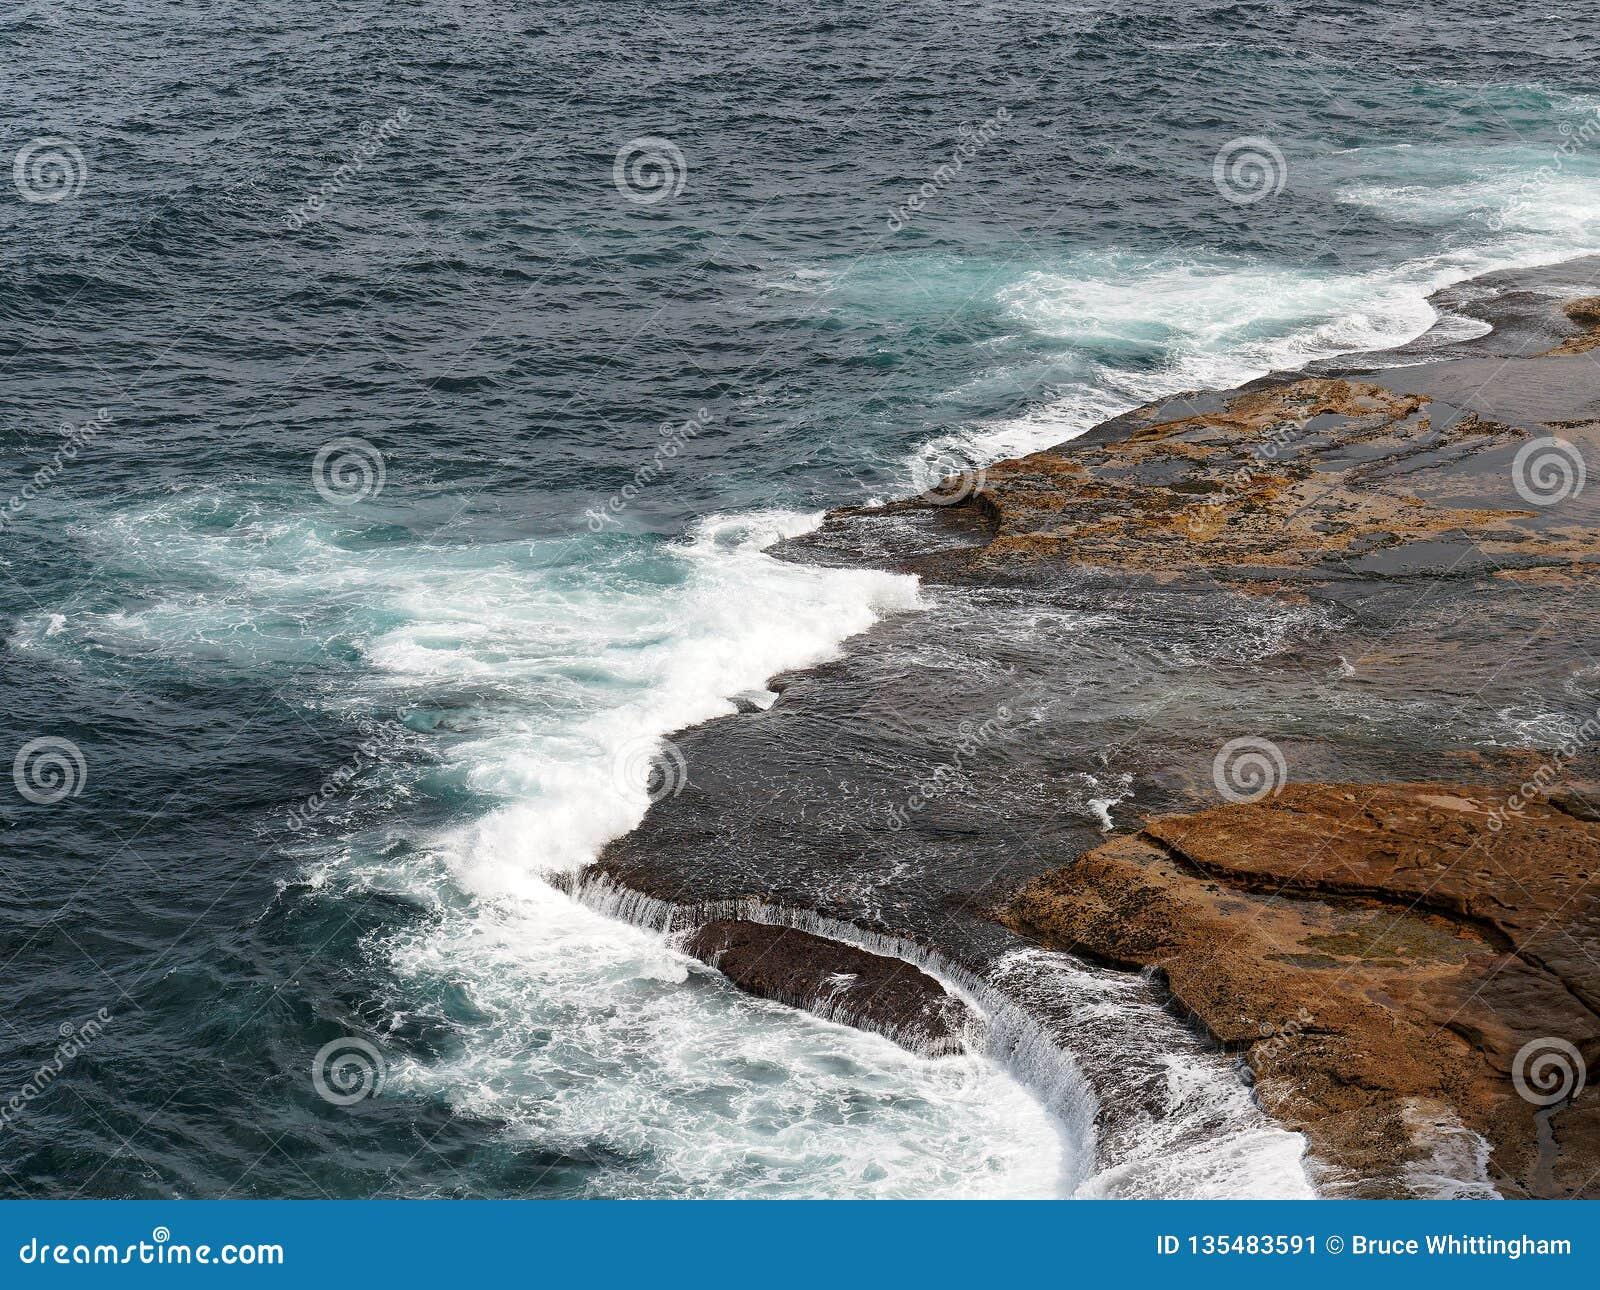 Powerful Pacific Ocean Waves Crashing on Rocks